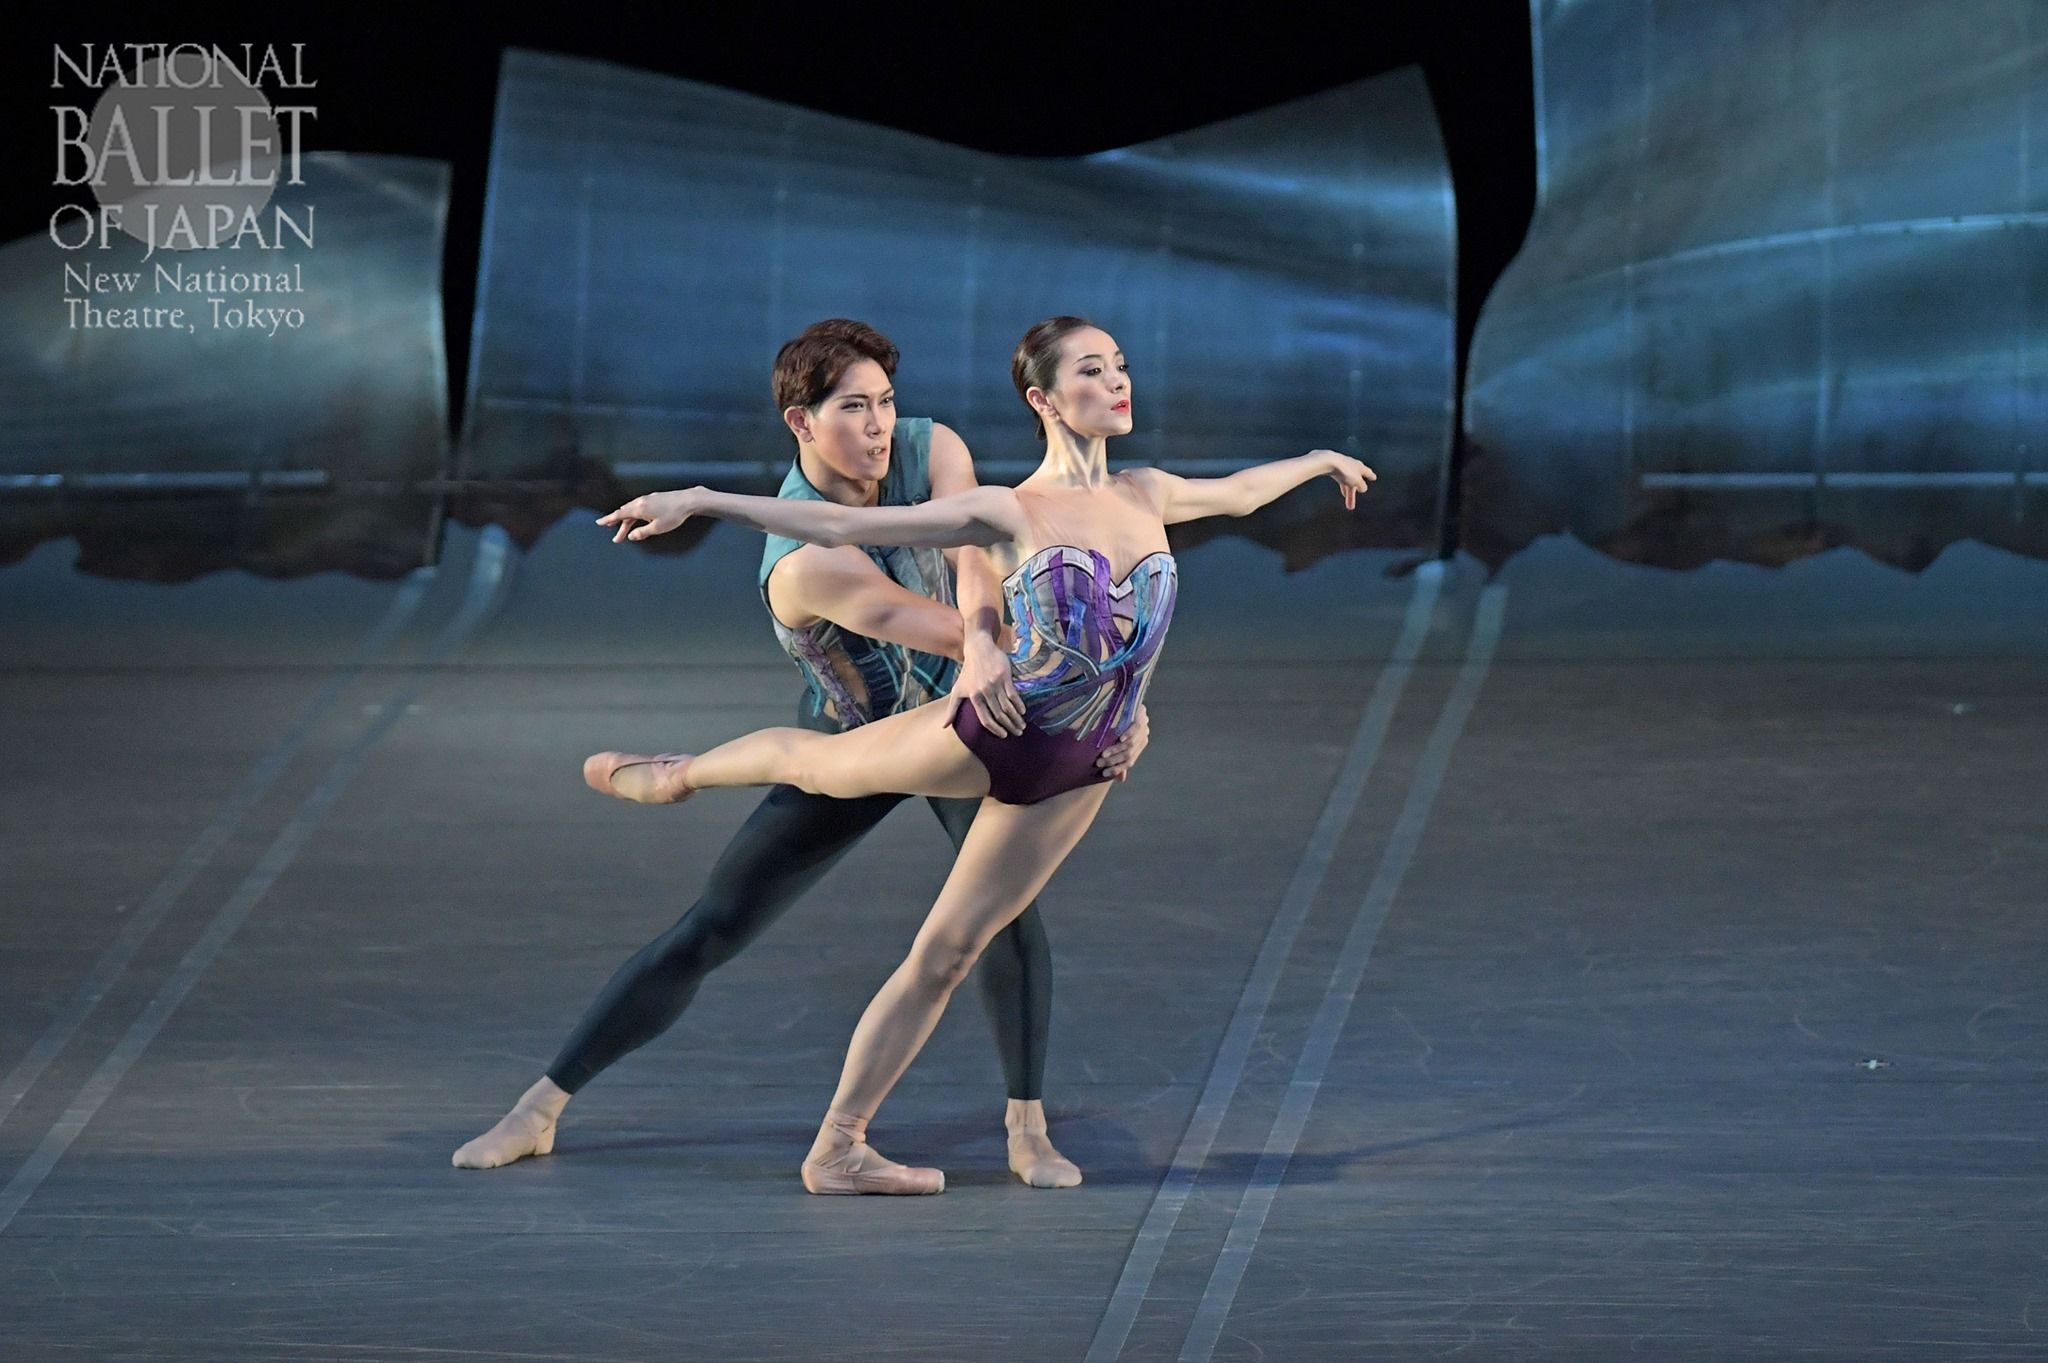 『DGV Danse à Grande Vitesse ©』本島美和、中家正博(撮影:鹿摩隆司/写真提供:新国立劇場)